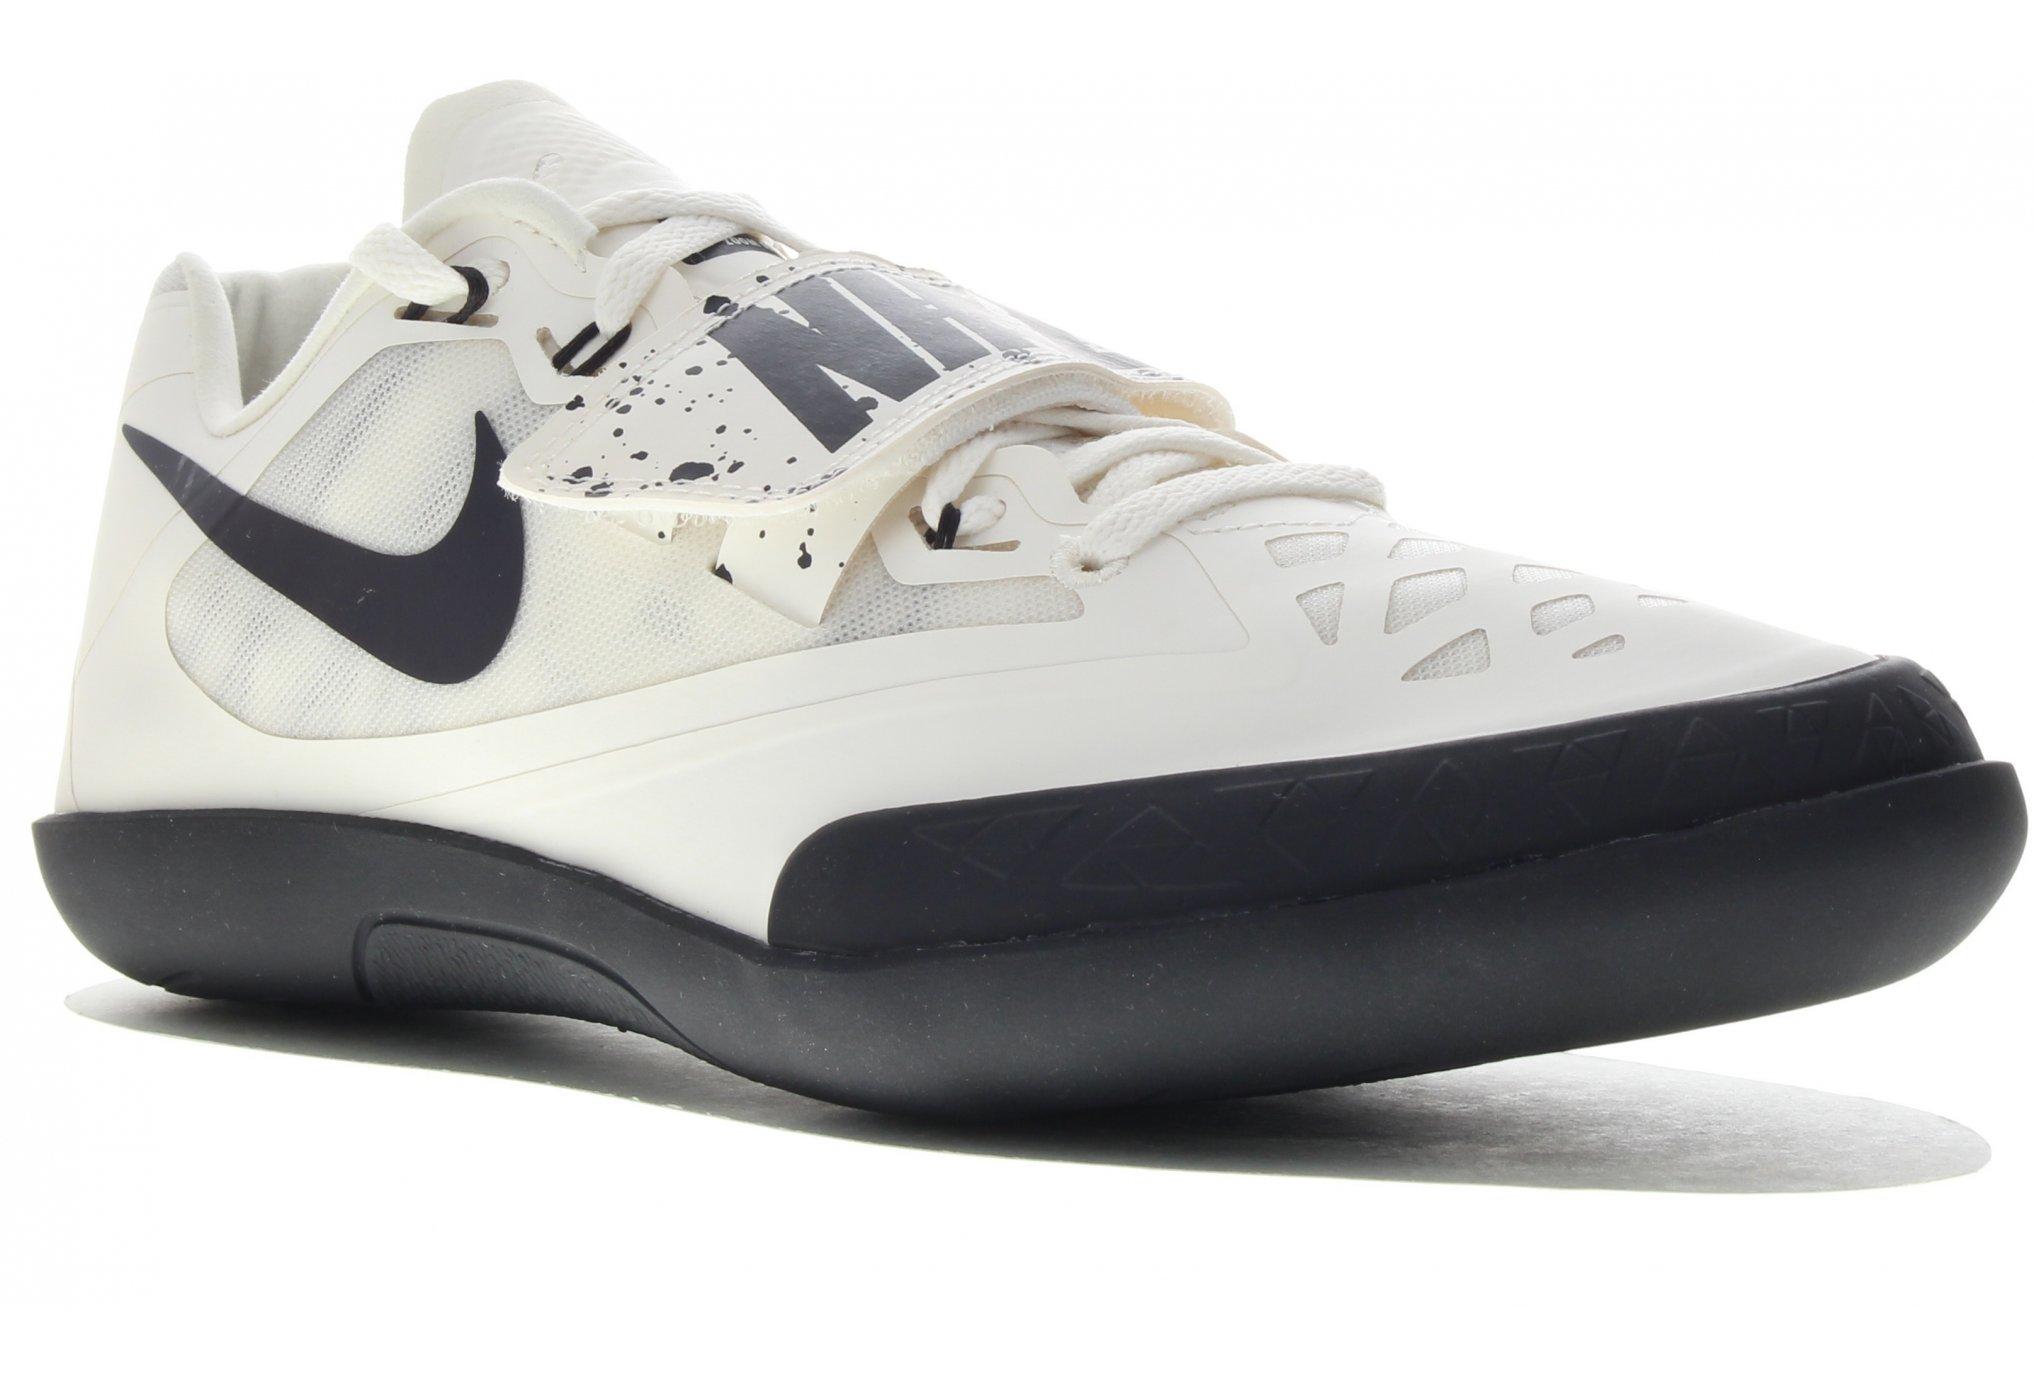 brand new f9f3c fc483 Nike Zoom Javelin Elite 2 M homme Bleu pas cher